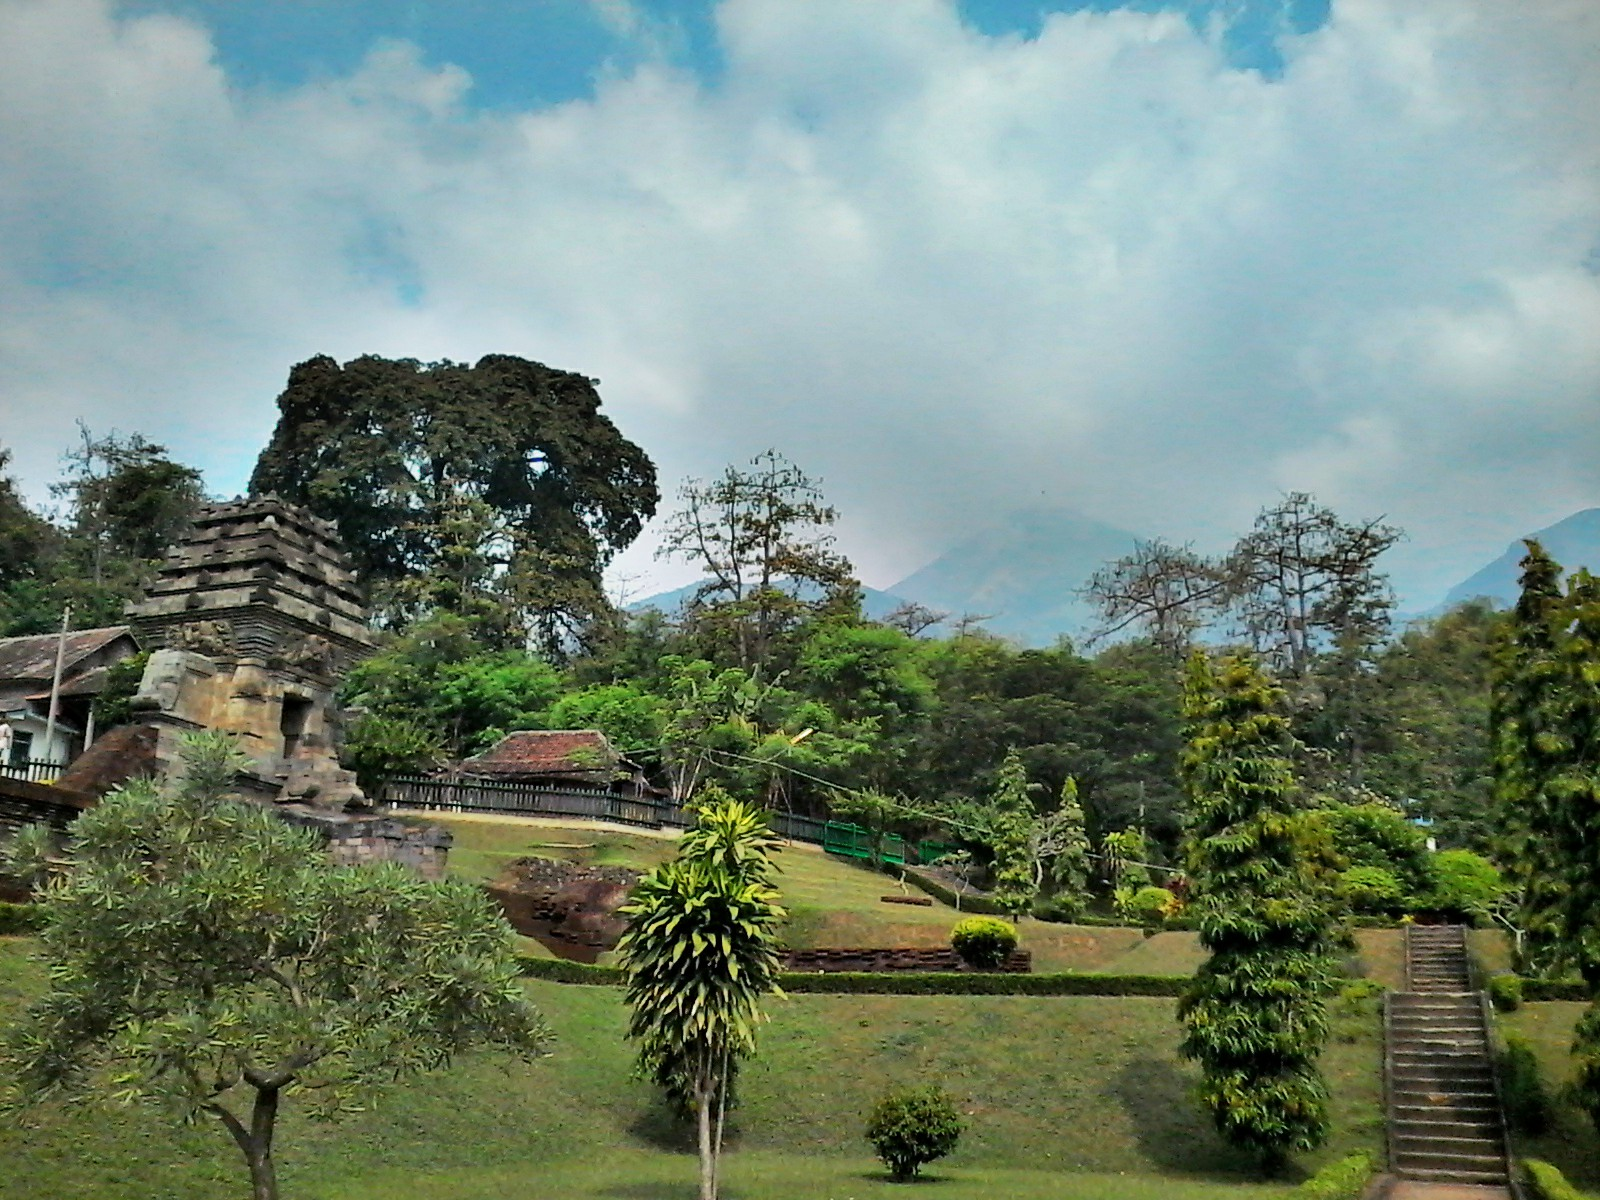 Candi Jedong Cantik Berdiri Kaki Pawitra Wanderpals Image Kab Mojokerto